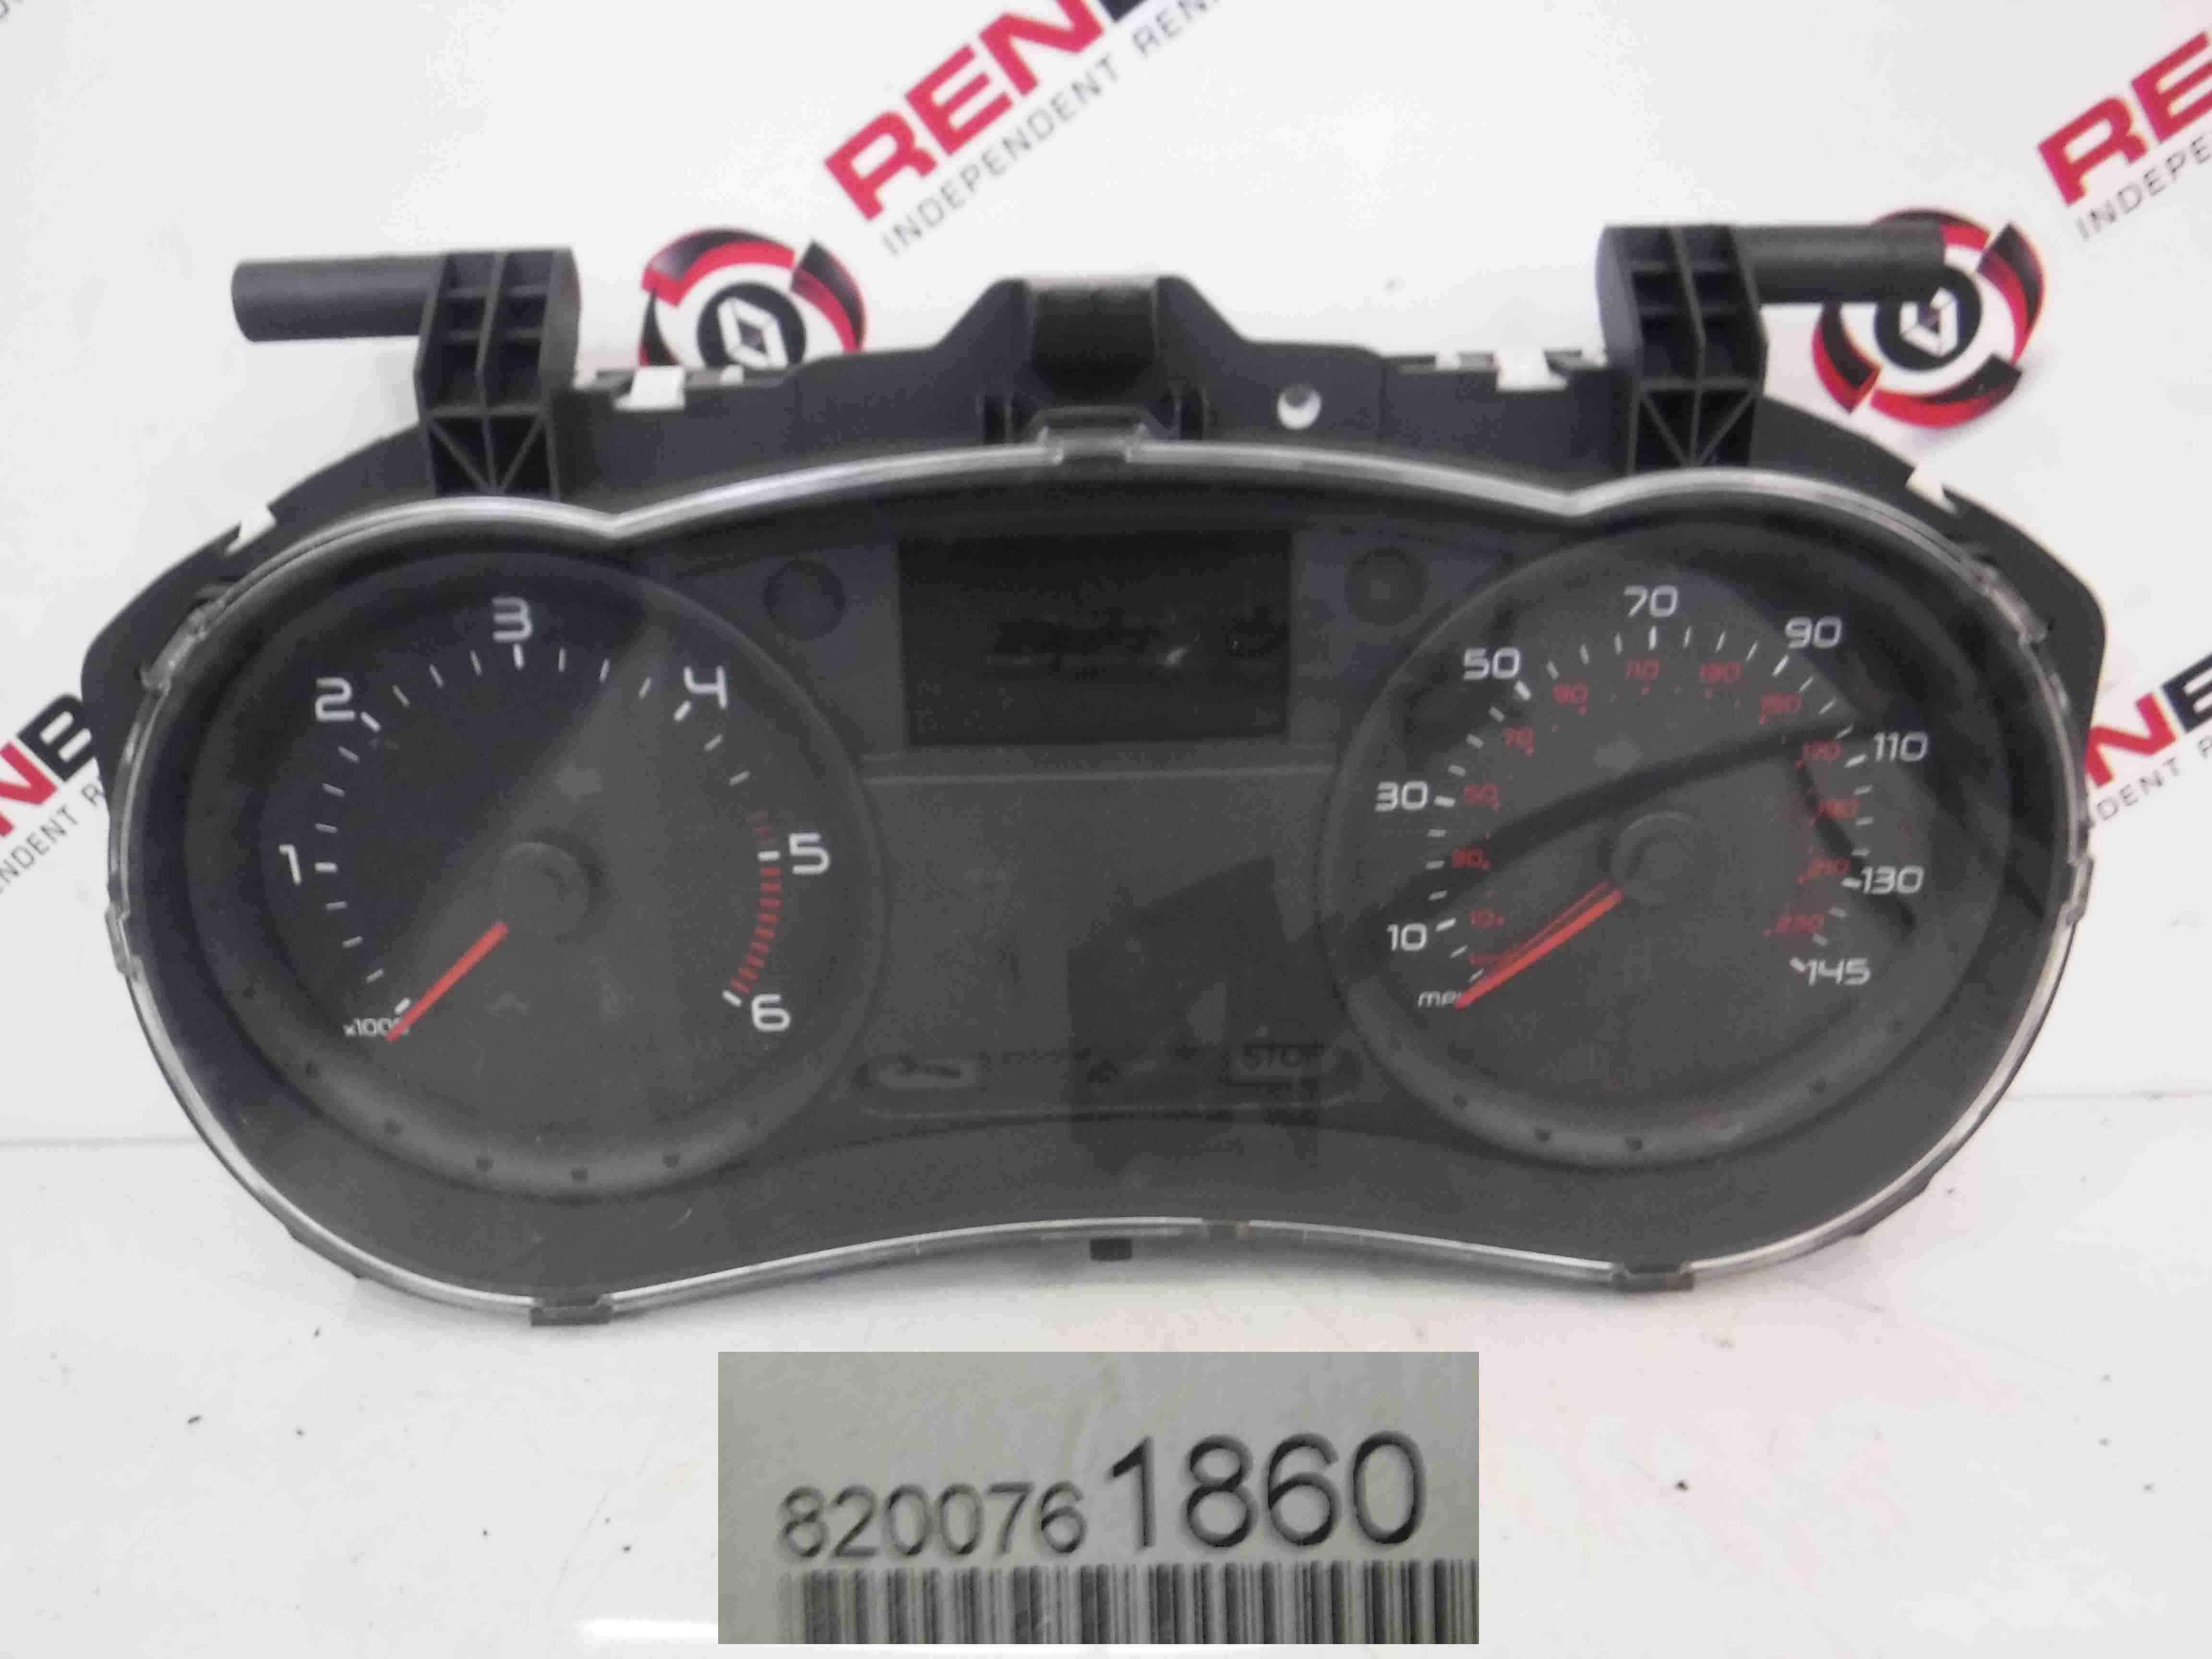 Renault Clio MK3 2005-2012 Instrument Panel Dials Gauges Clocks 119K 8200761860